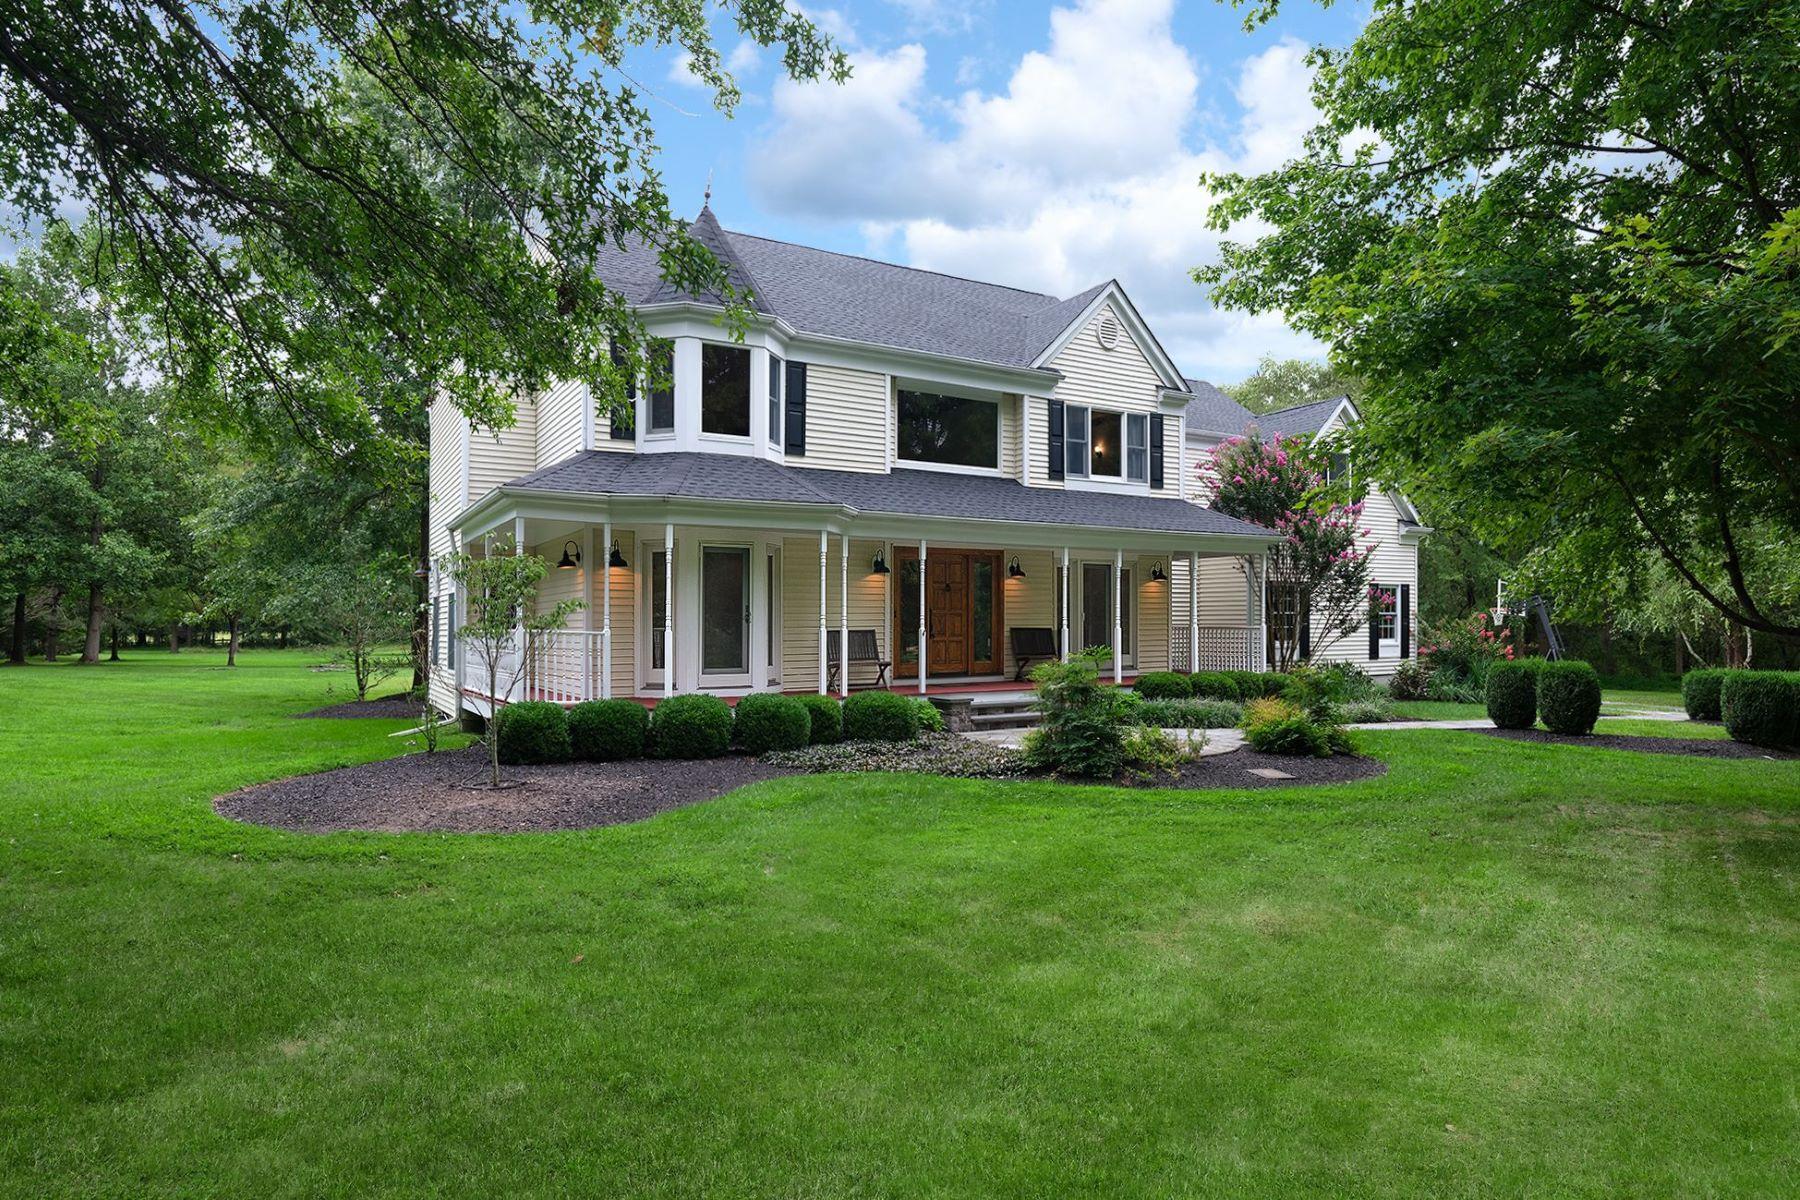 Single Family Homes por un Venta en Start Your Next Chapter Here 54 Ferry Road, Stockton, Nueva Jersey 08559 Estados Unidos